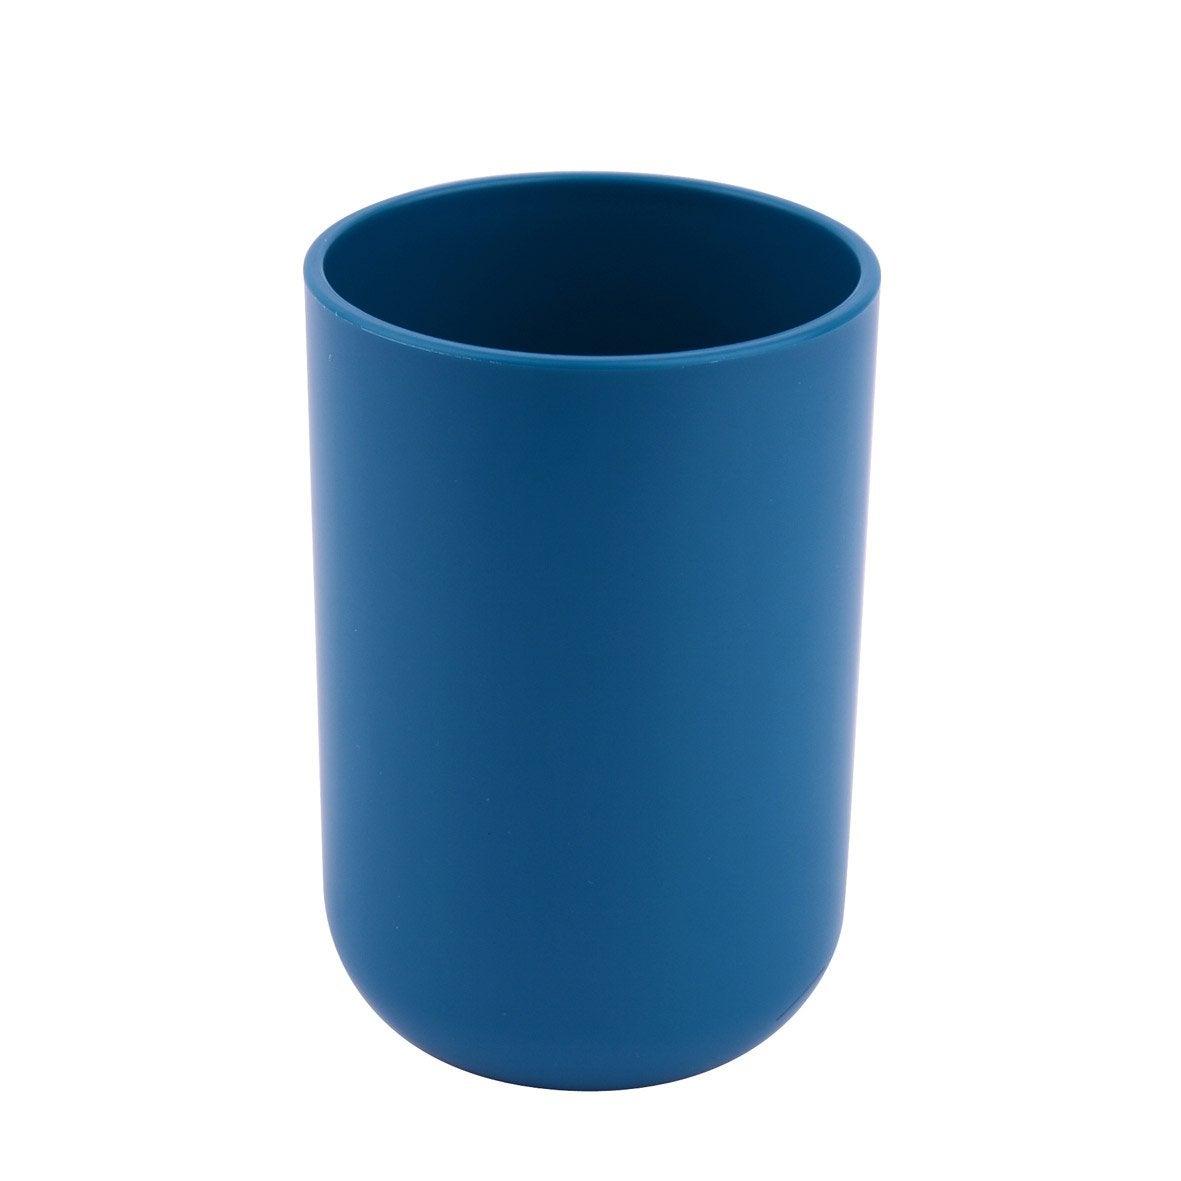 Gobelet plastique Easy, miami n°1